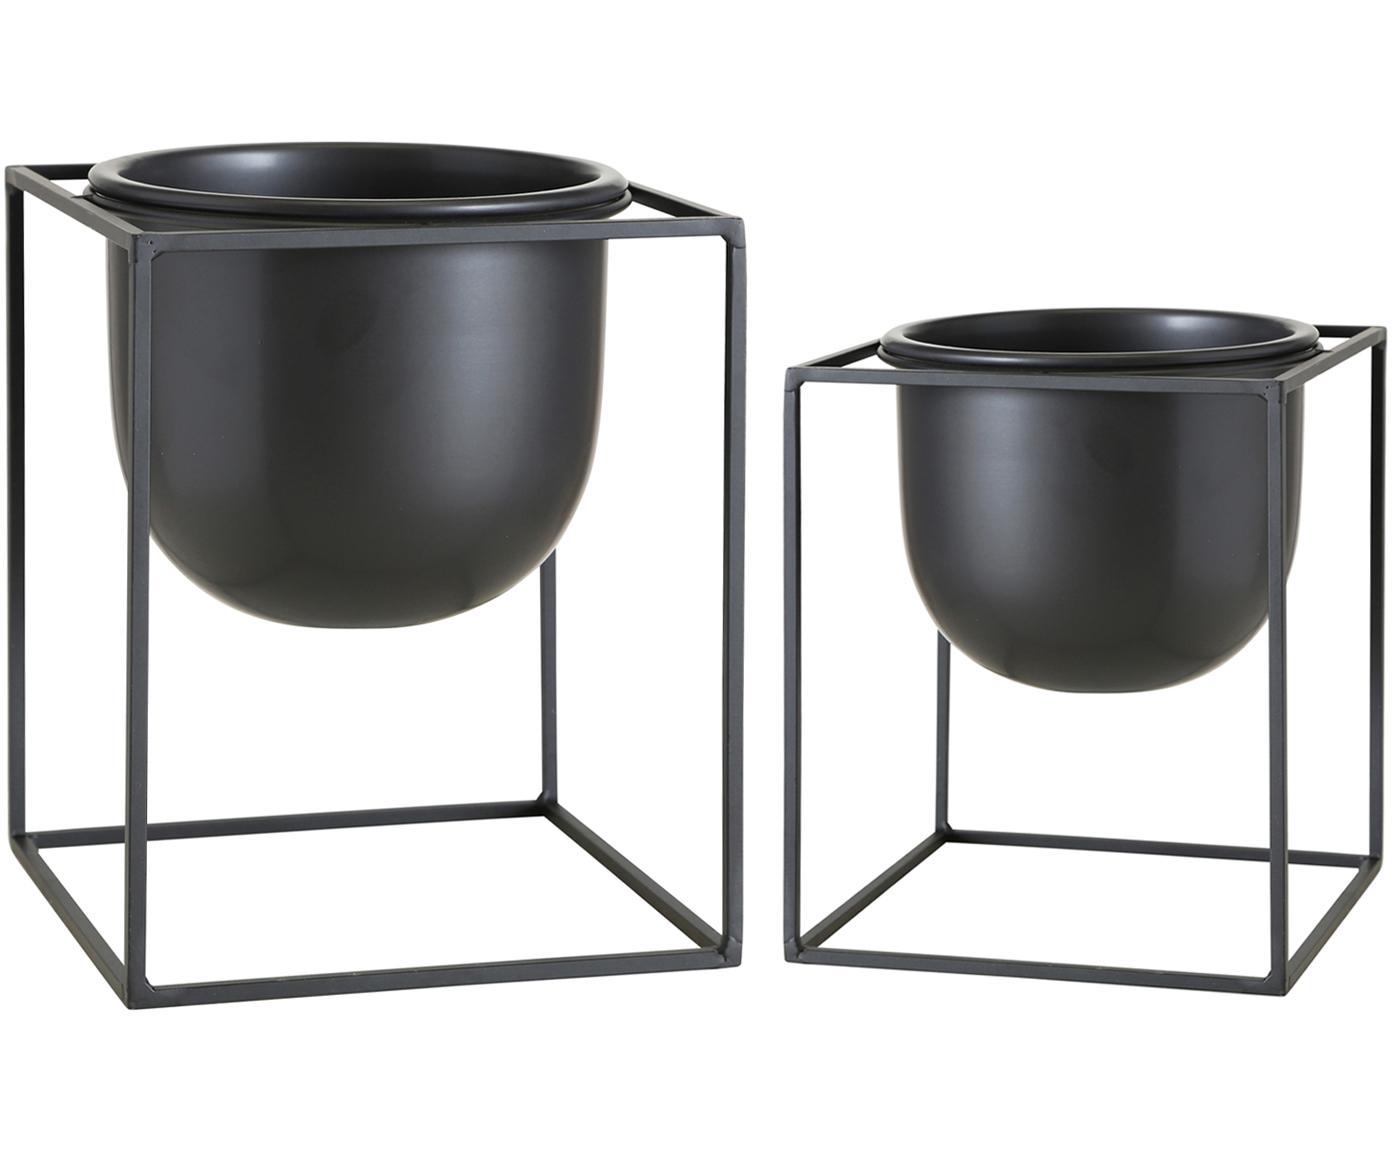 Set 2 portavasi in metallo Kumbo, Metallo, Nero, Diverse dimensioni